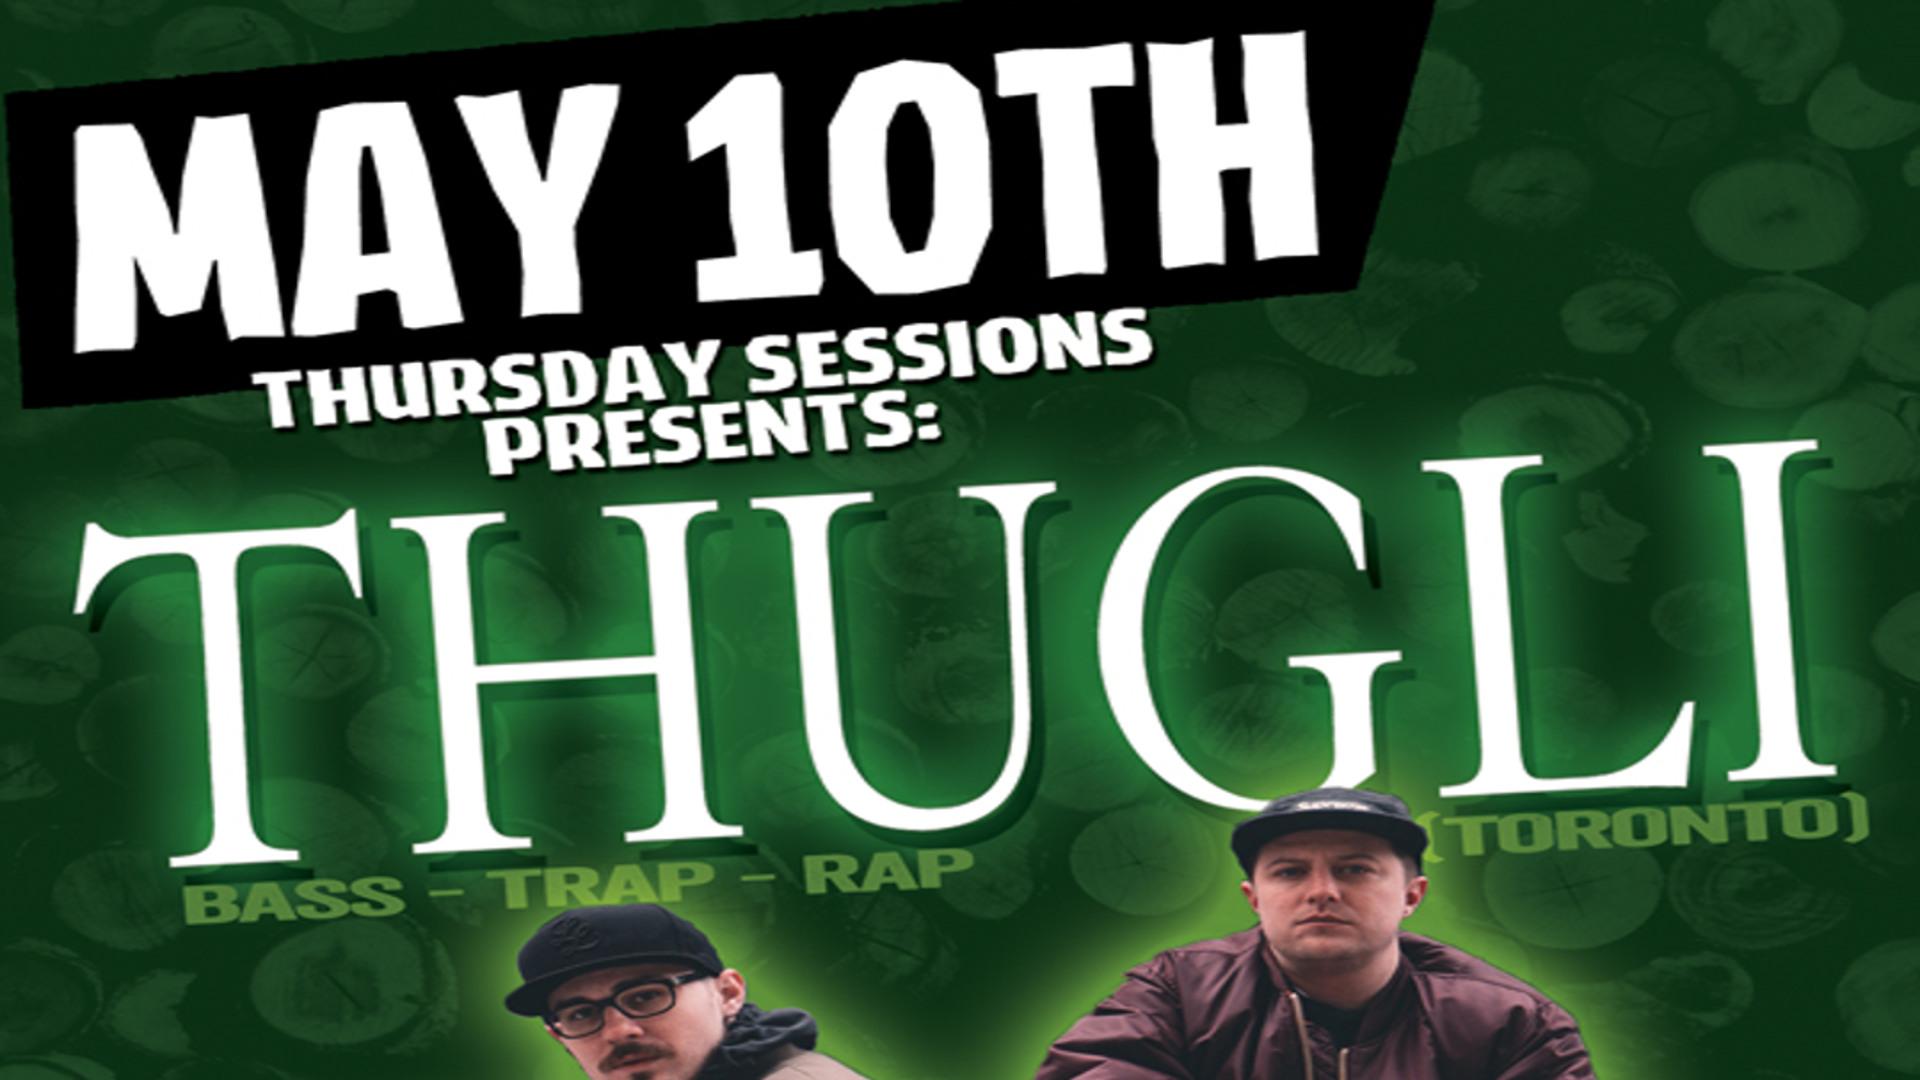 sasquatch may 10 2018 thugli event.jpg